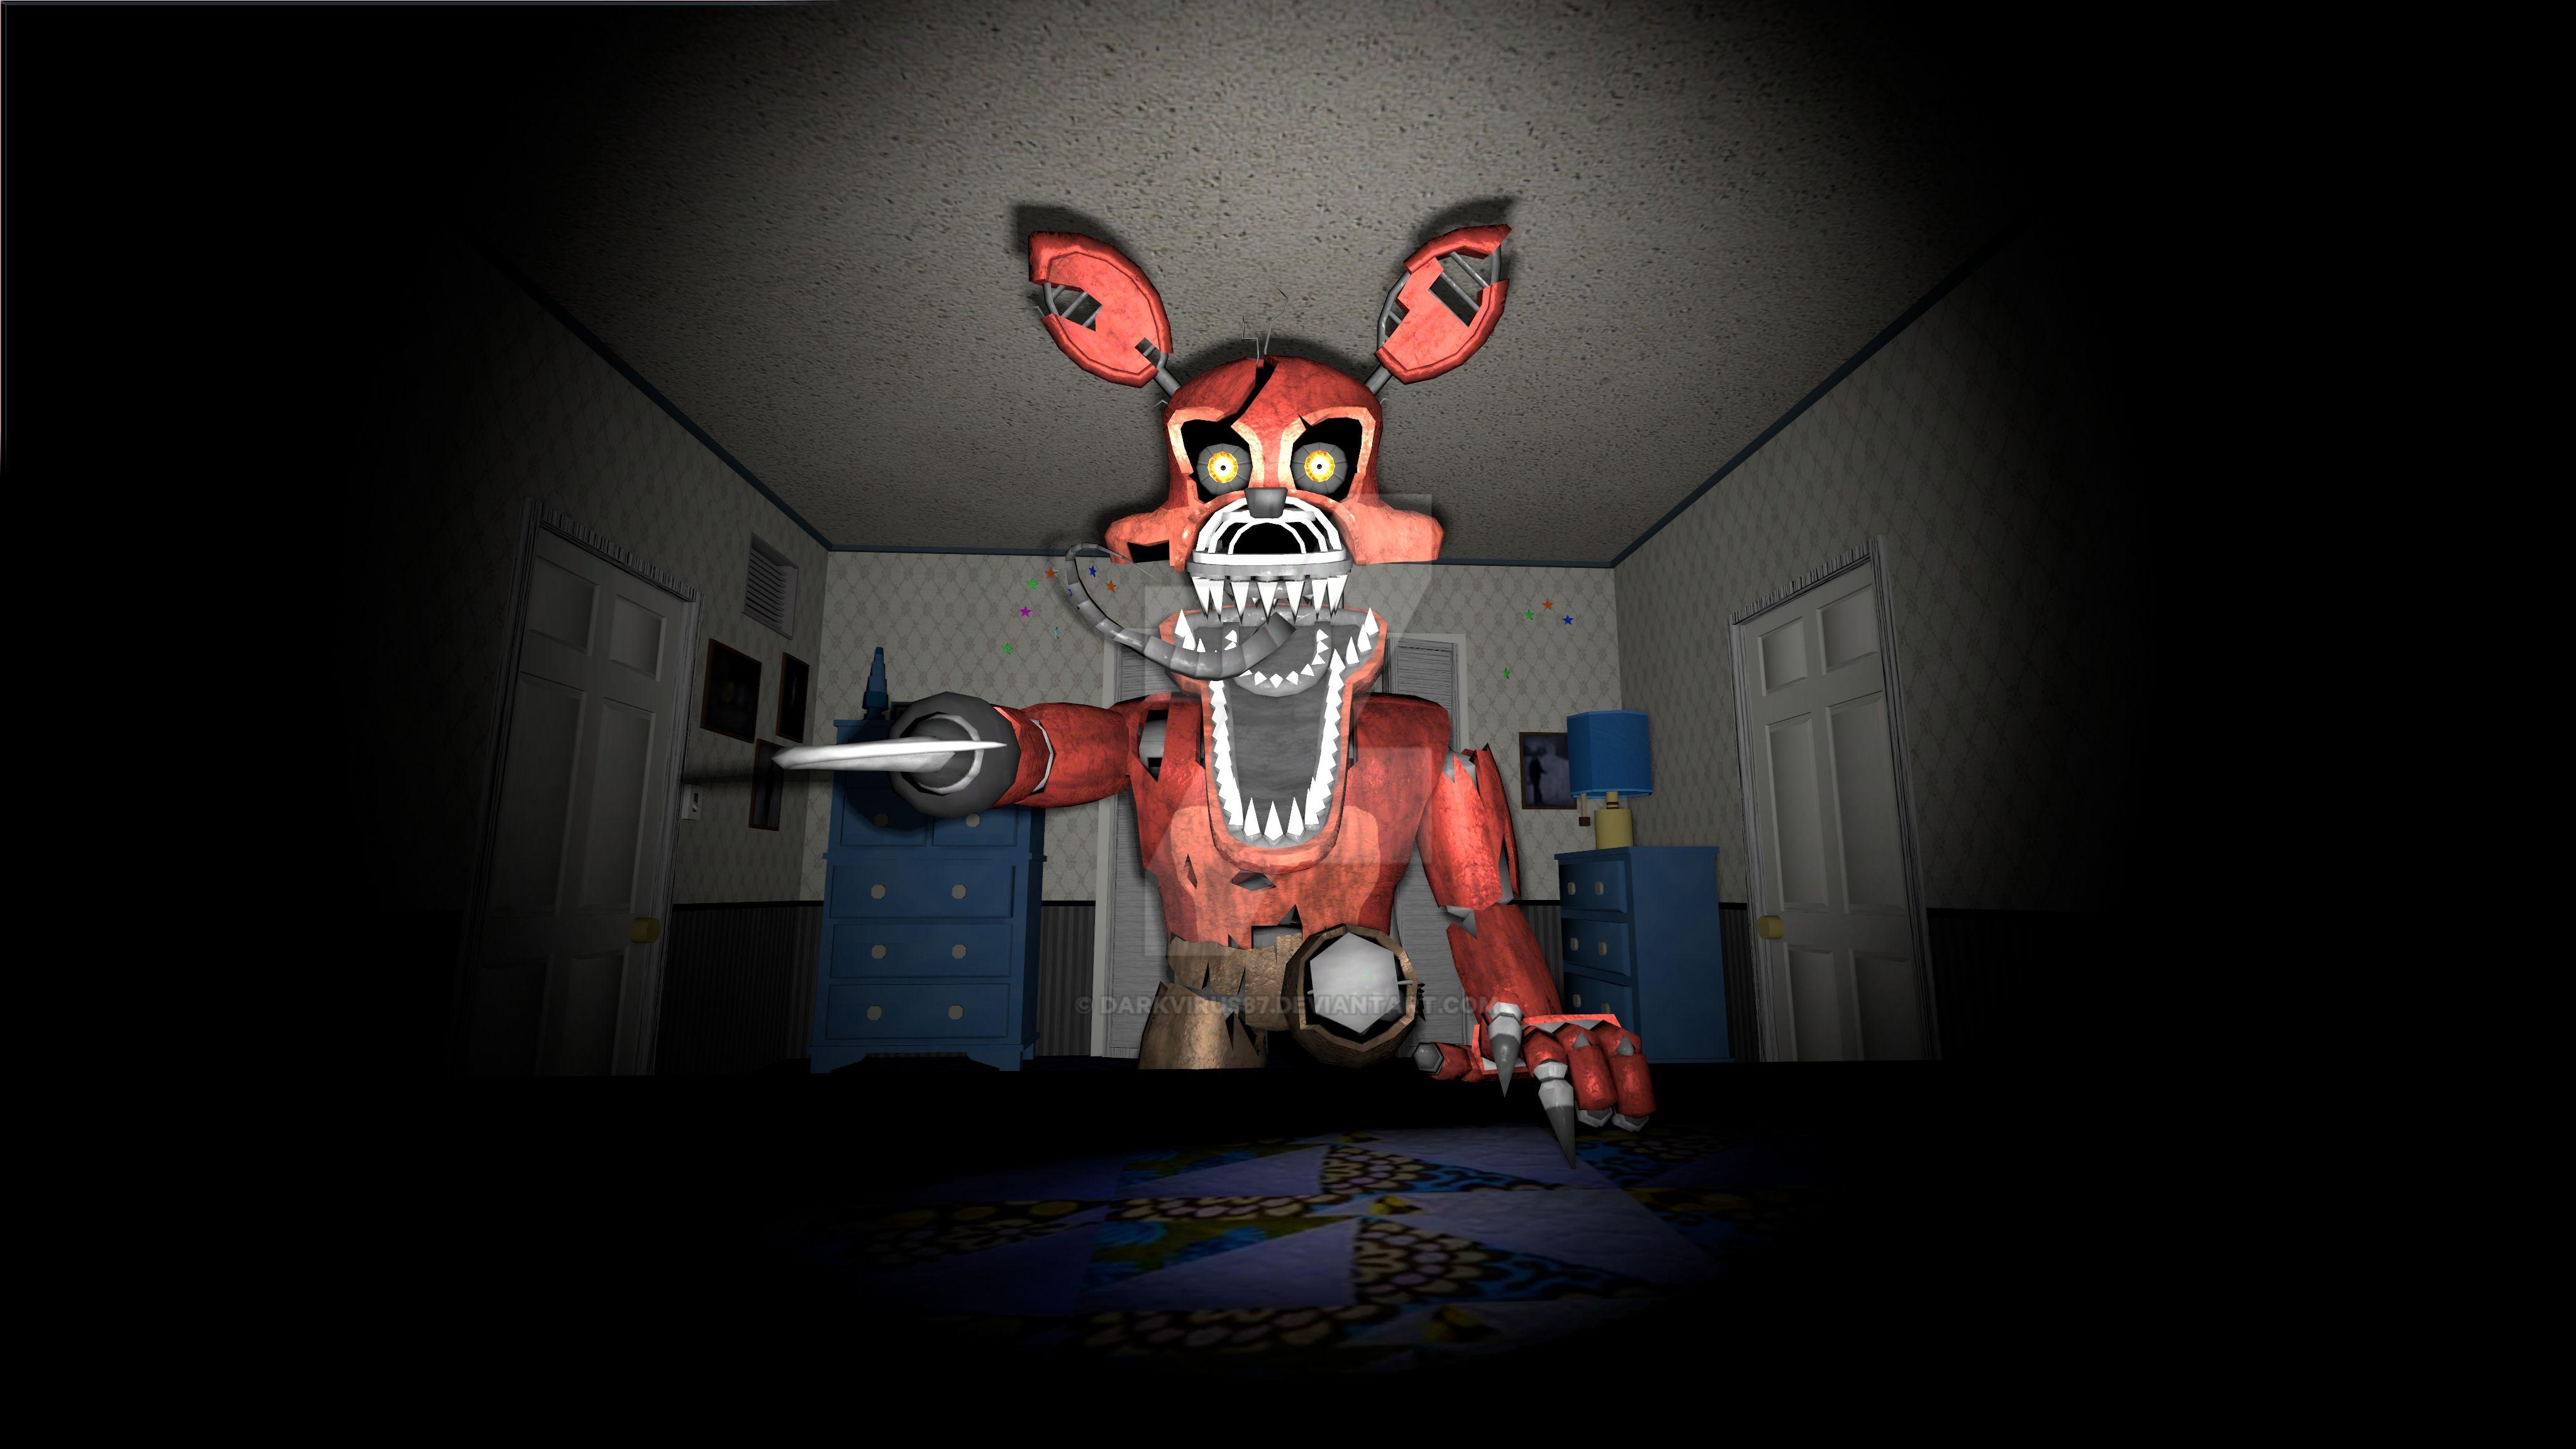 [FNaF SFM] Foxy Found You by DarkVirus87